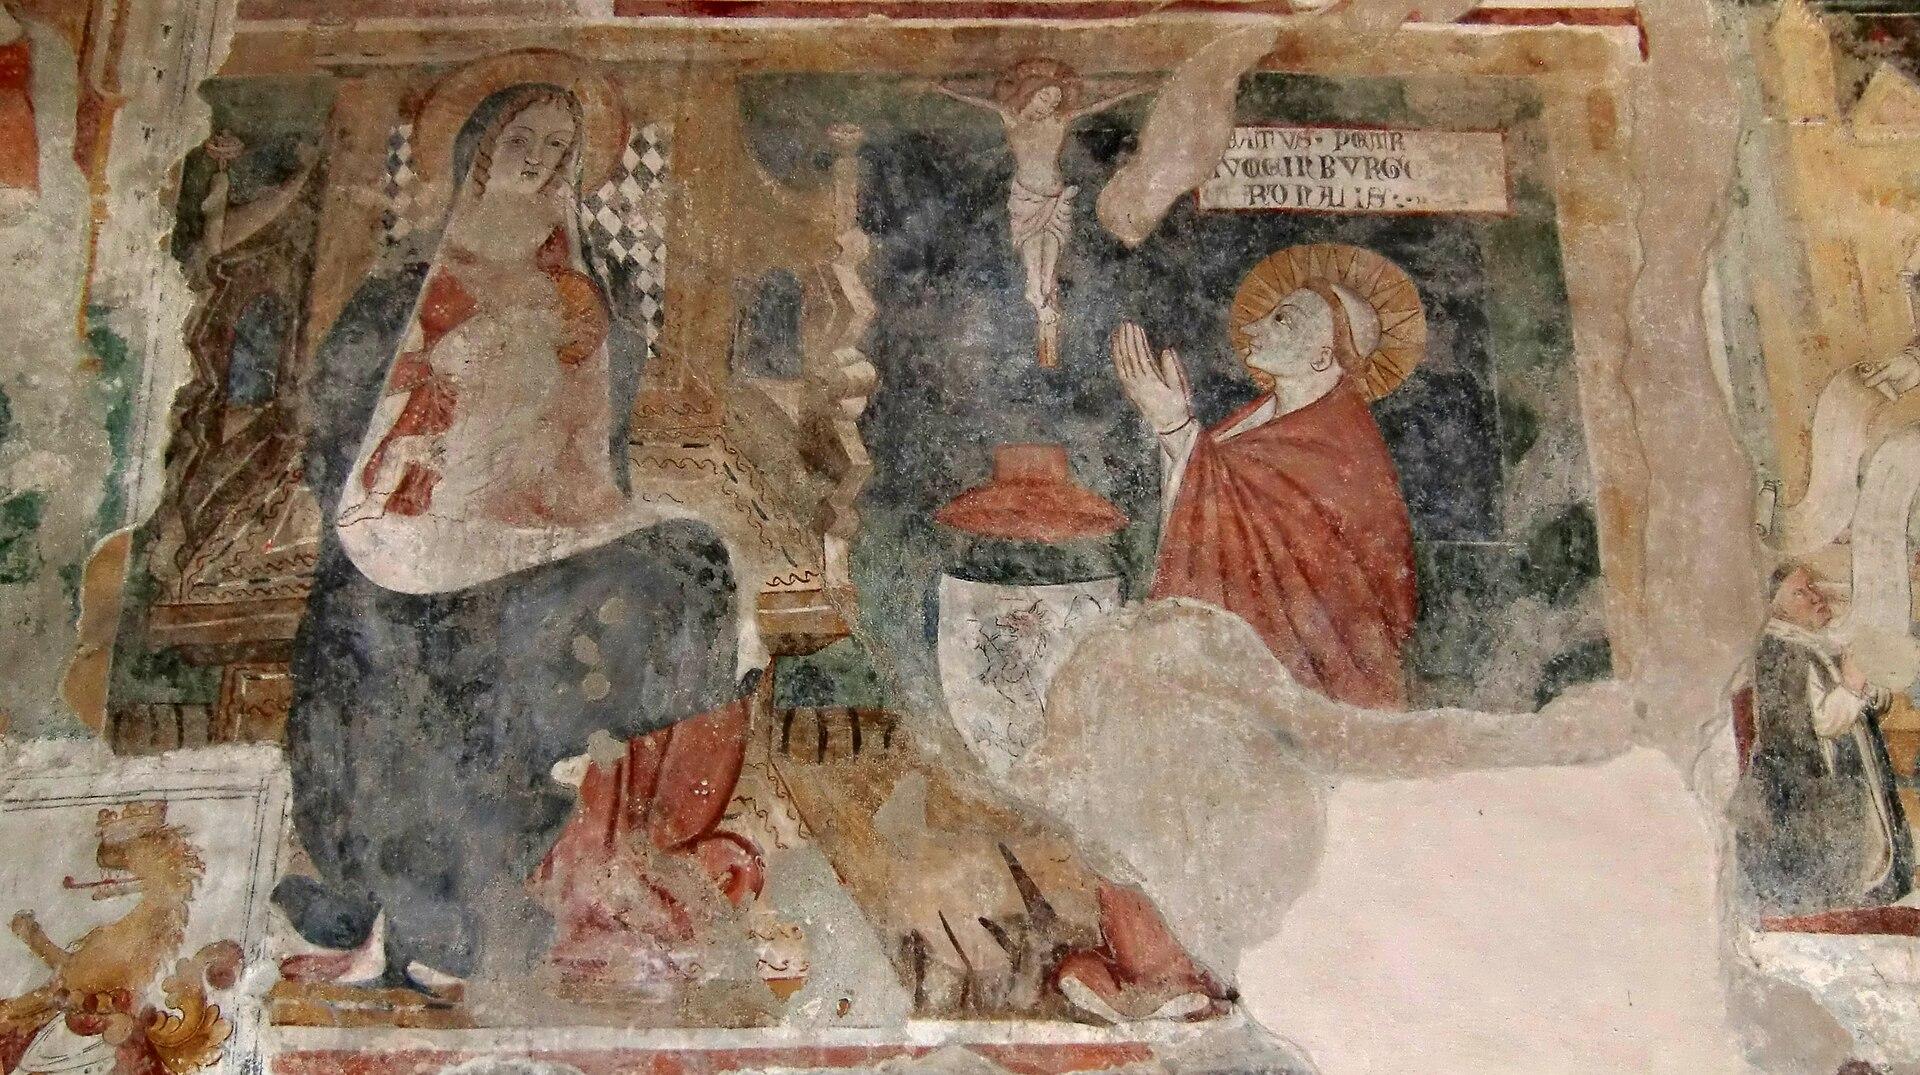 https://upload.wikimedia.org/wikipedia/commons/thumb/8/81/Settimo_Vittone_Pieve_San_Lorenzo_Affreschi_10.JPG/1920px-Settimo_Vittone_Pieve_San_Lorenzo_Affreschi_10.JPG?1467429896013